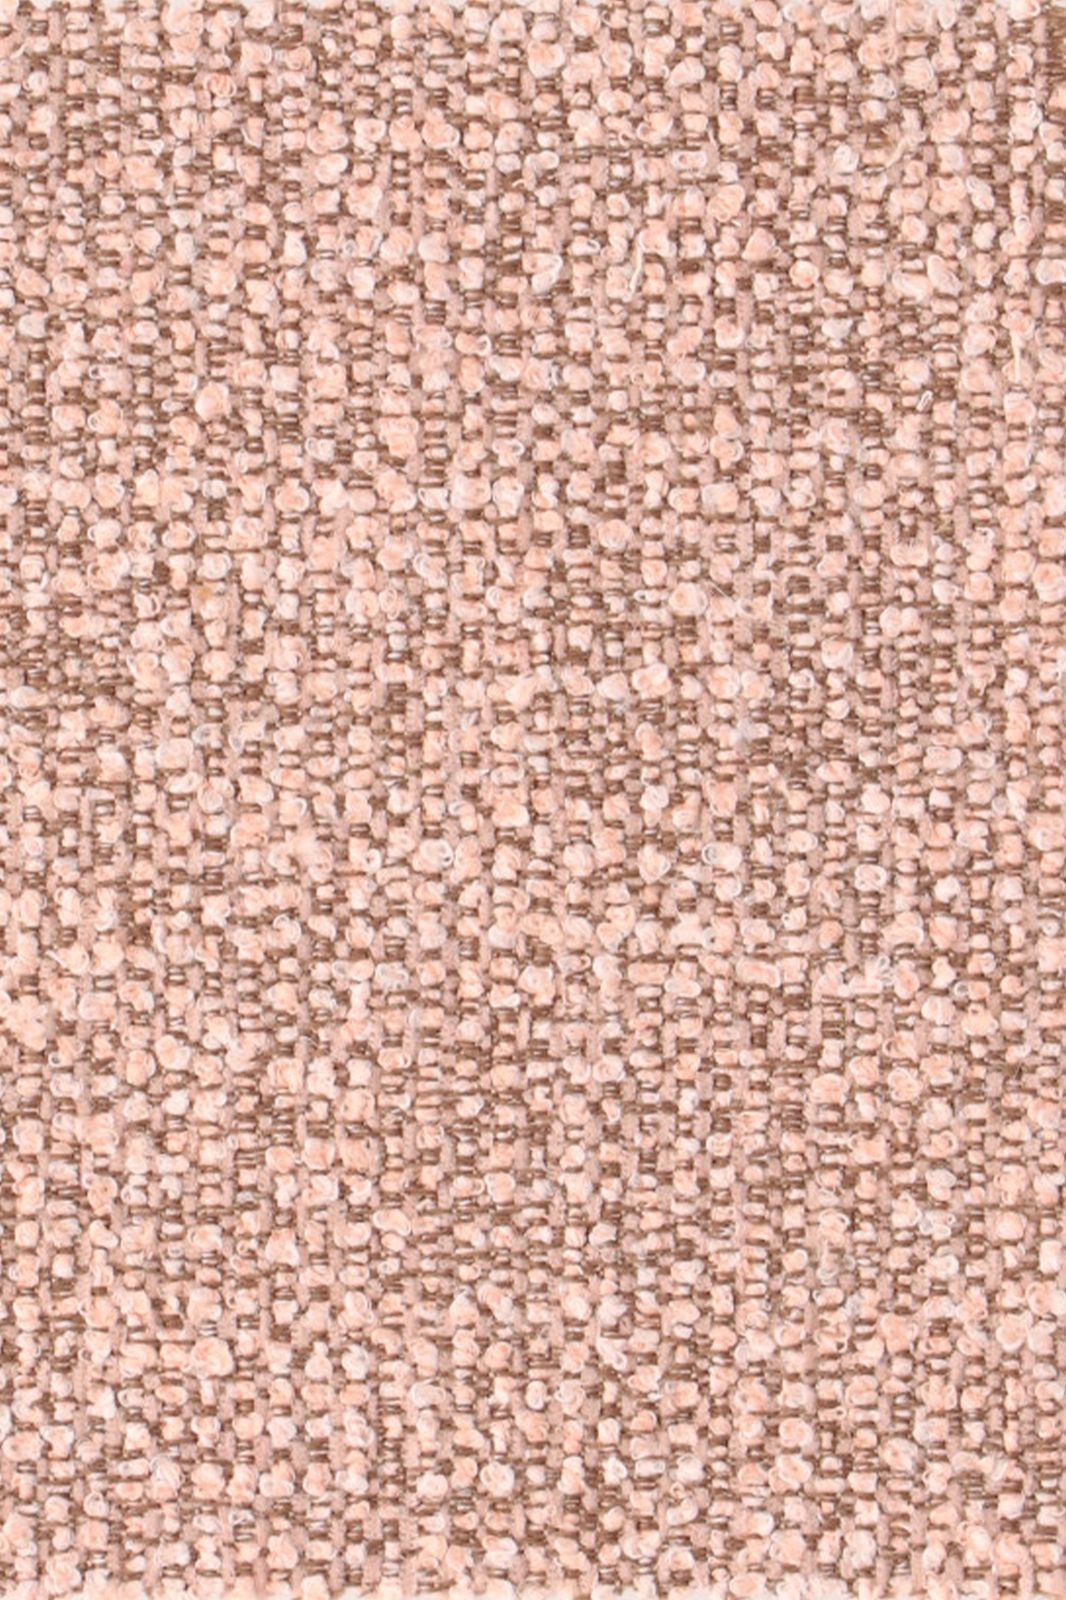 Stofstaal Baron bank roze/karamel melee - Homeland | Sissy-Boy